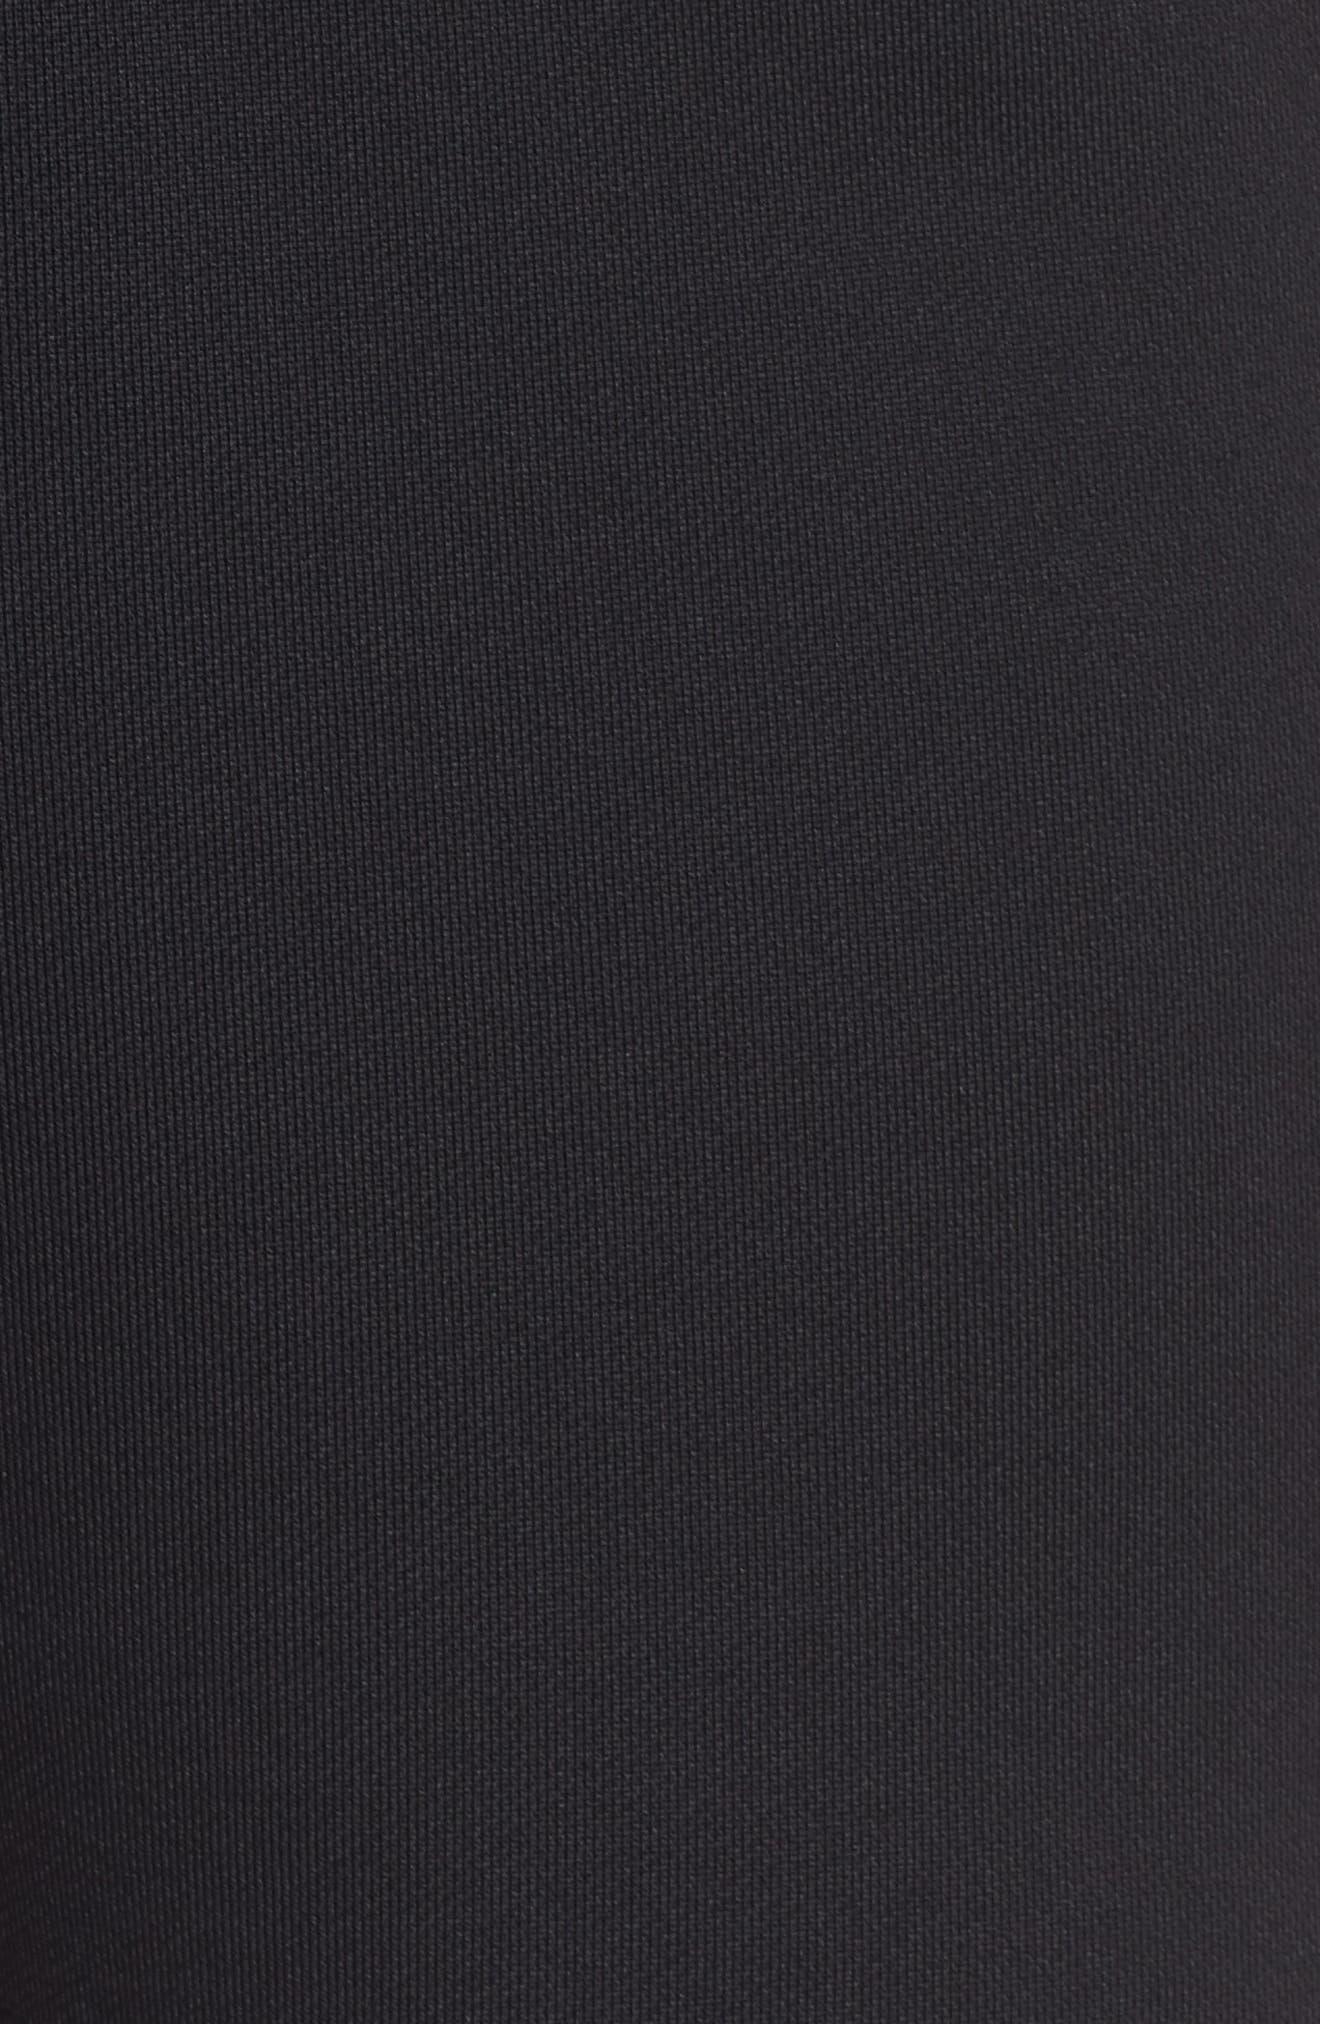 NikeLab Collection Women's Fleece Shorts,                             Alternate thumbnail 6, color,                             BLACK/ BLACK